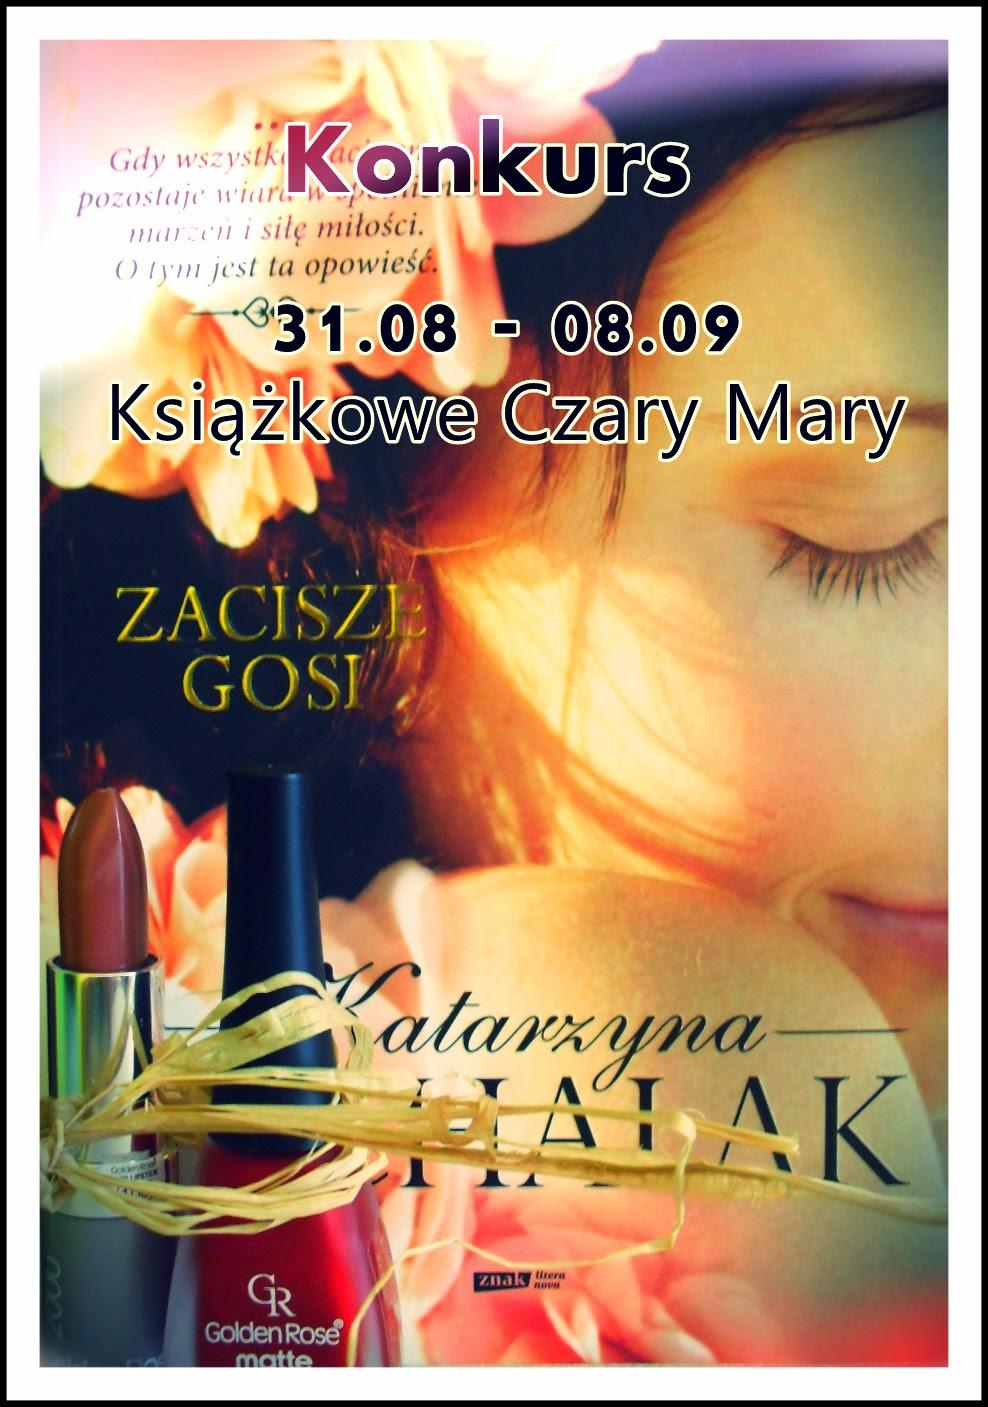 http://szelestksiazek.blogspot.com/2014/08/konkurs-na-zakonczenie-lata.html